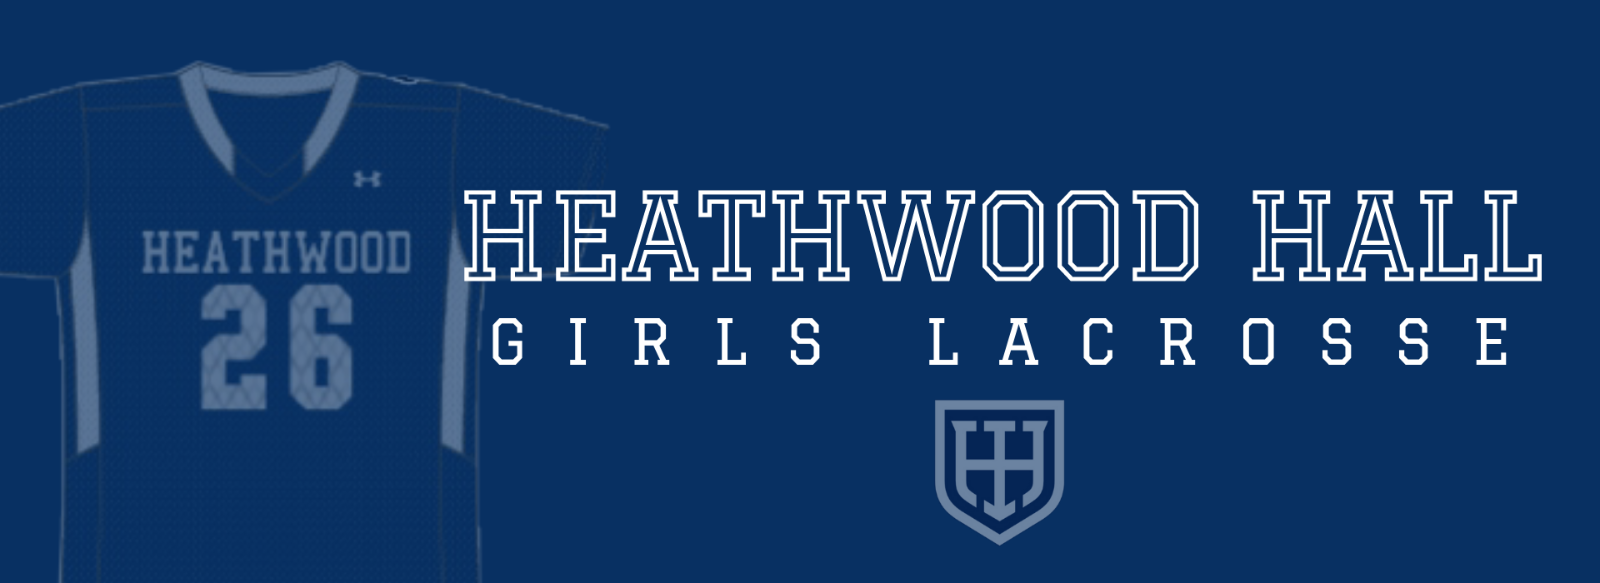 Heathwood Girls Lacrosse Interest Meeting